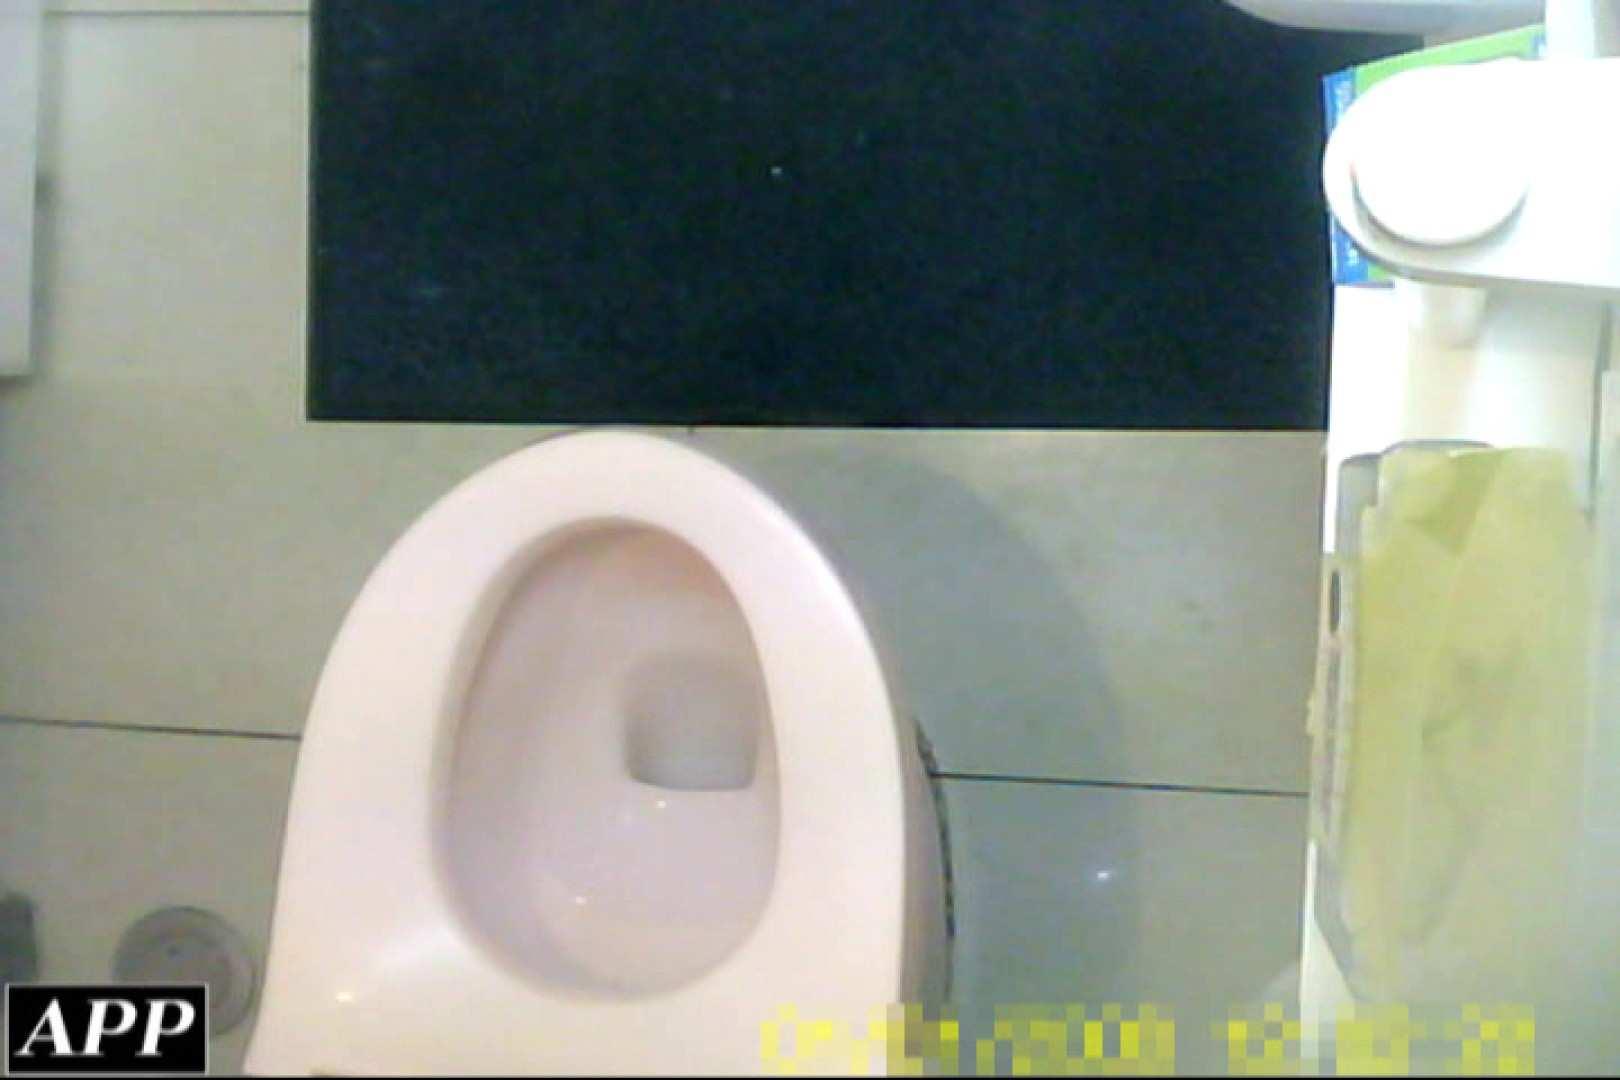 3視点洗面所 vol.041 洗面所 | OLセックス  52画像 37